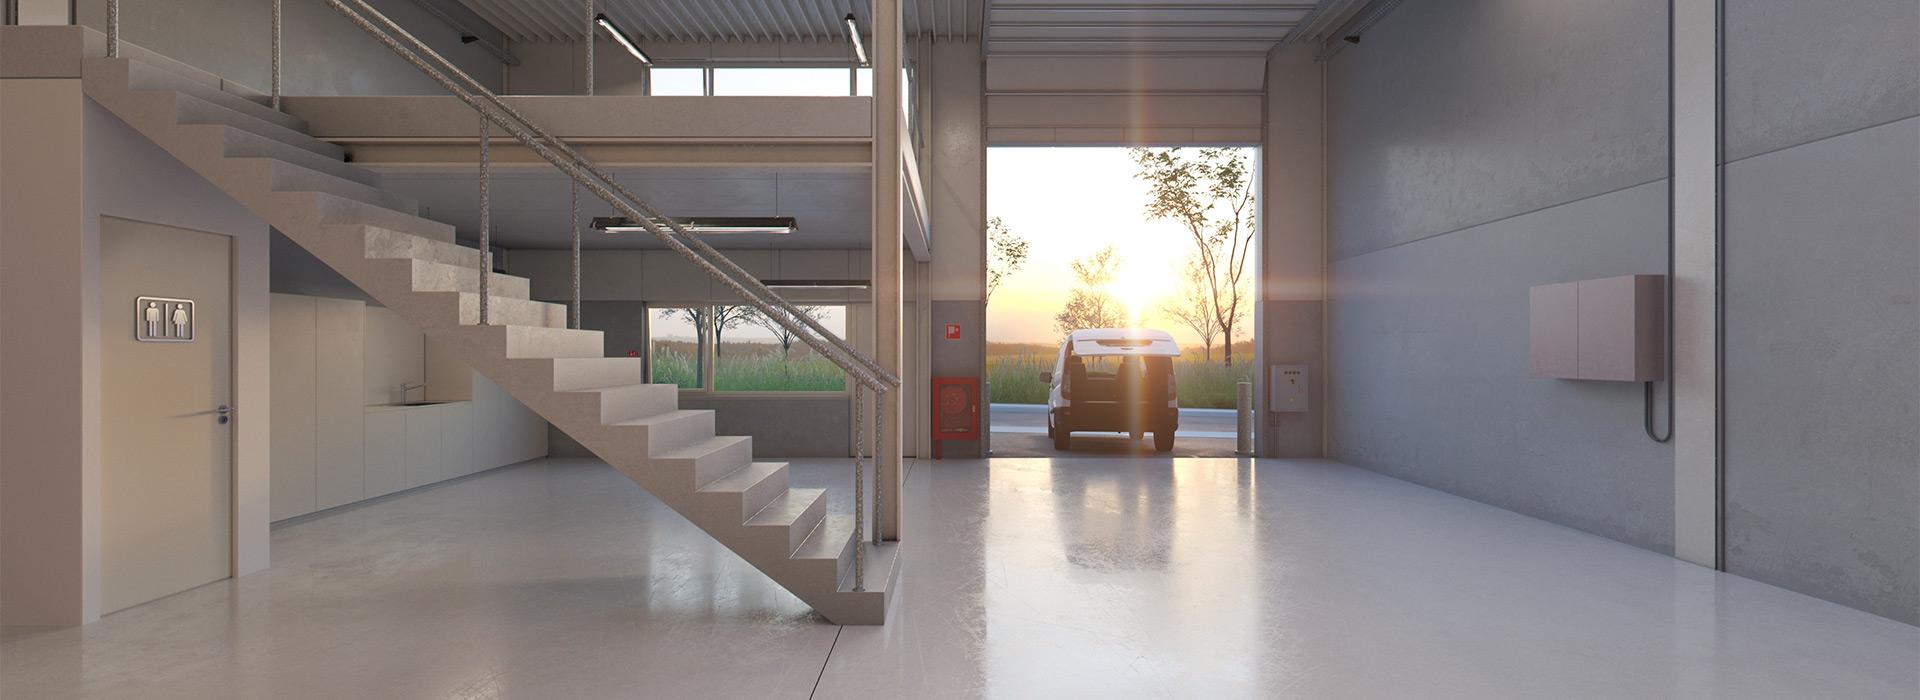 carnaperhof-_-interieur-casco-_-editorial-MEO_crop